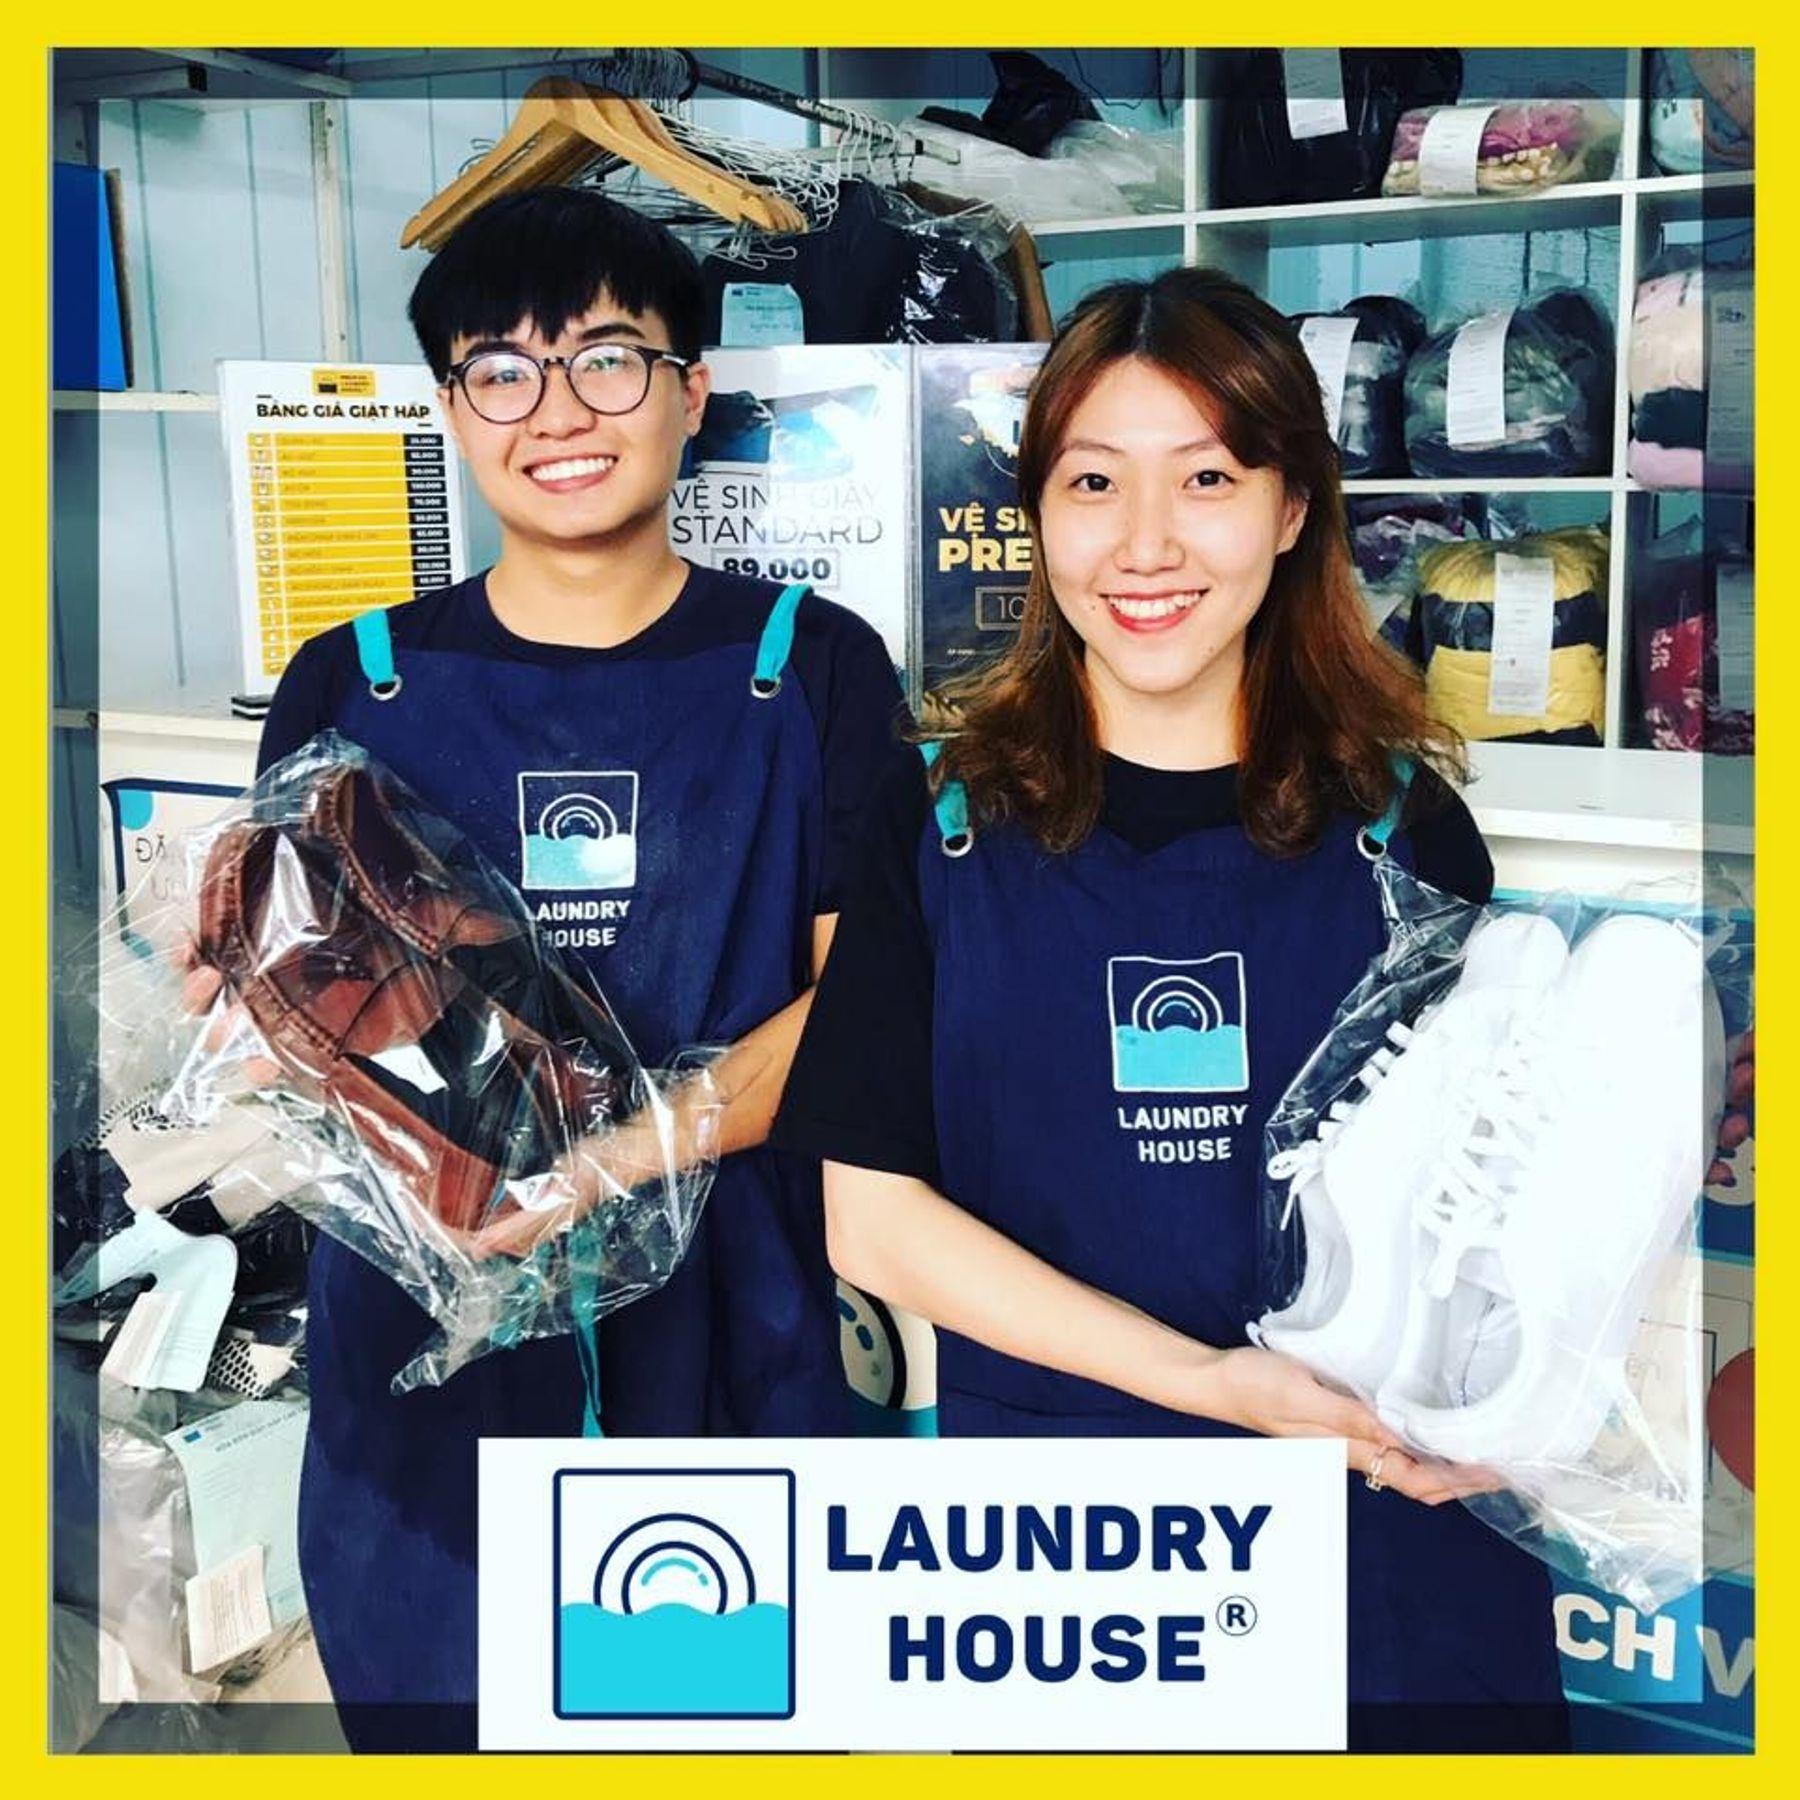 Dịch vụ giặt giày Laundry House